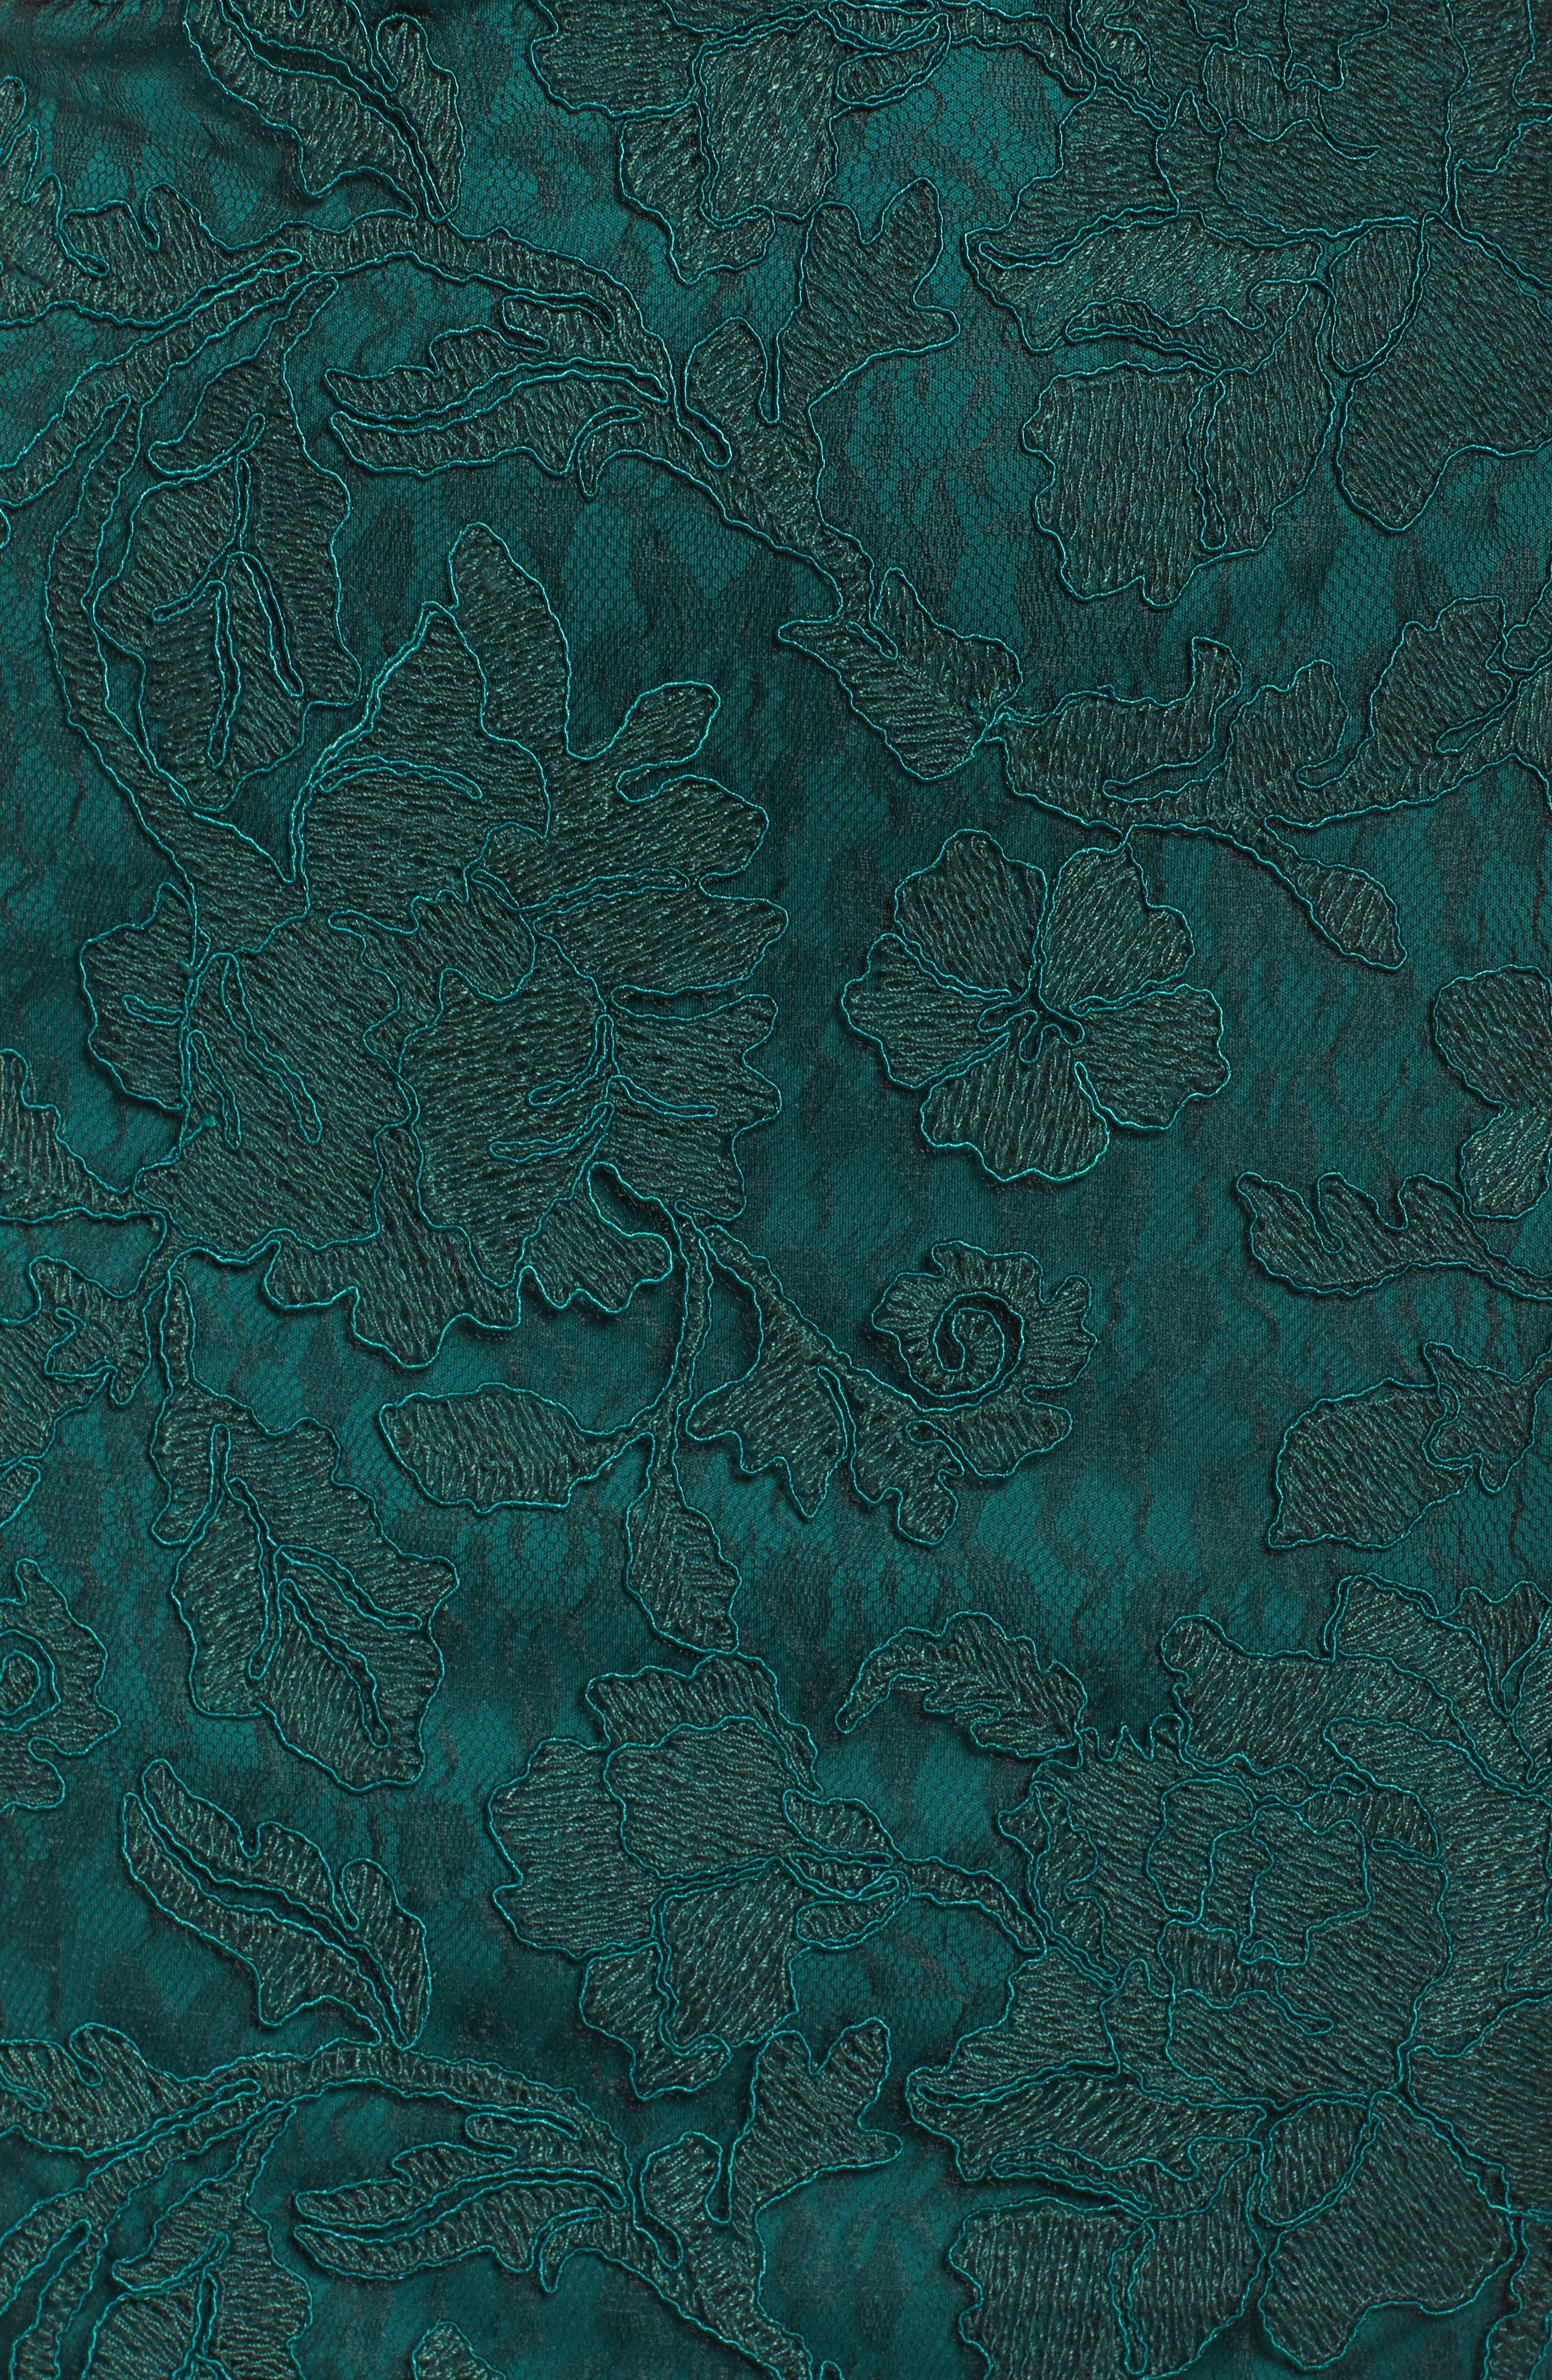 Corded Lace Sheath Dress,                             Alternate thumbnail 5, color,                             376